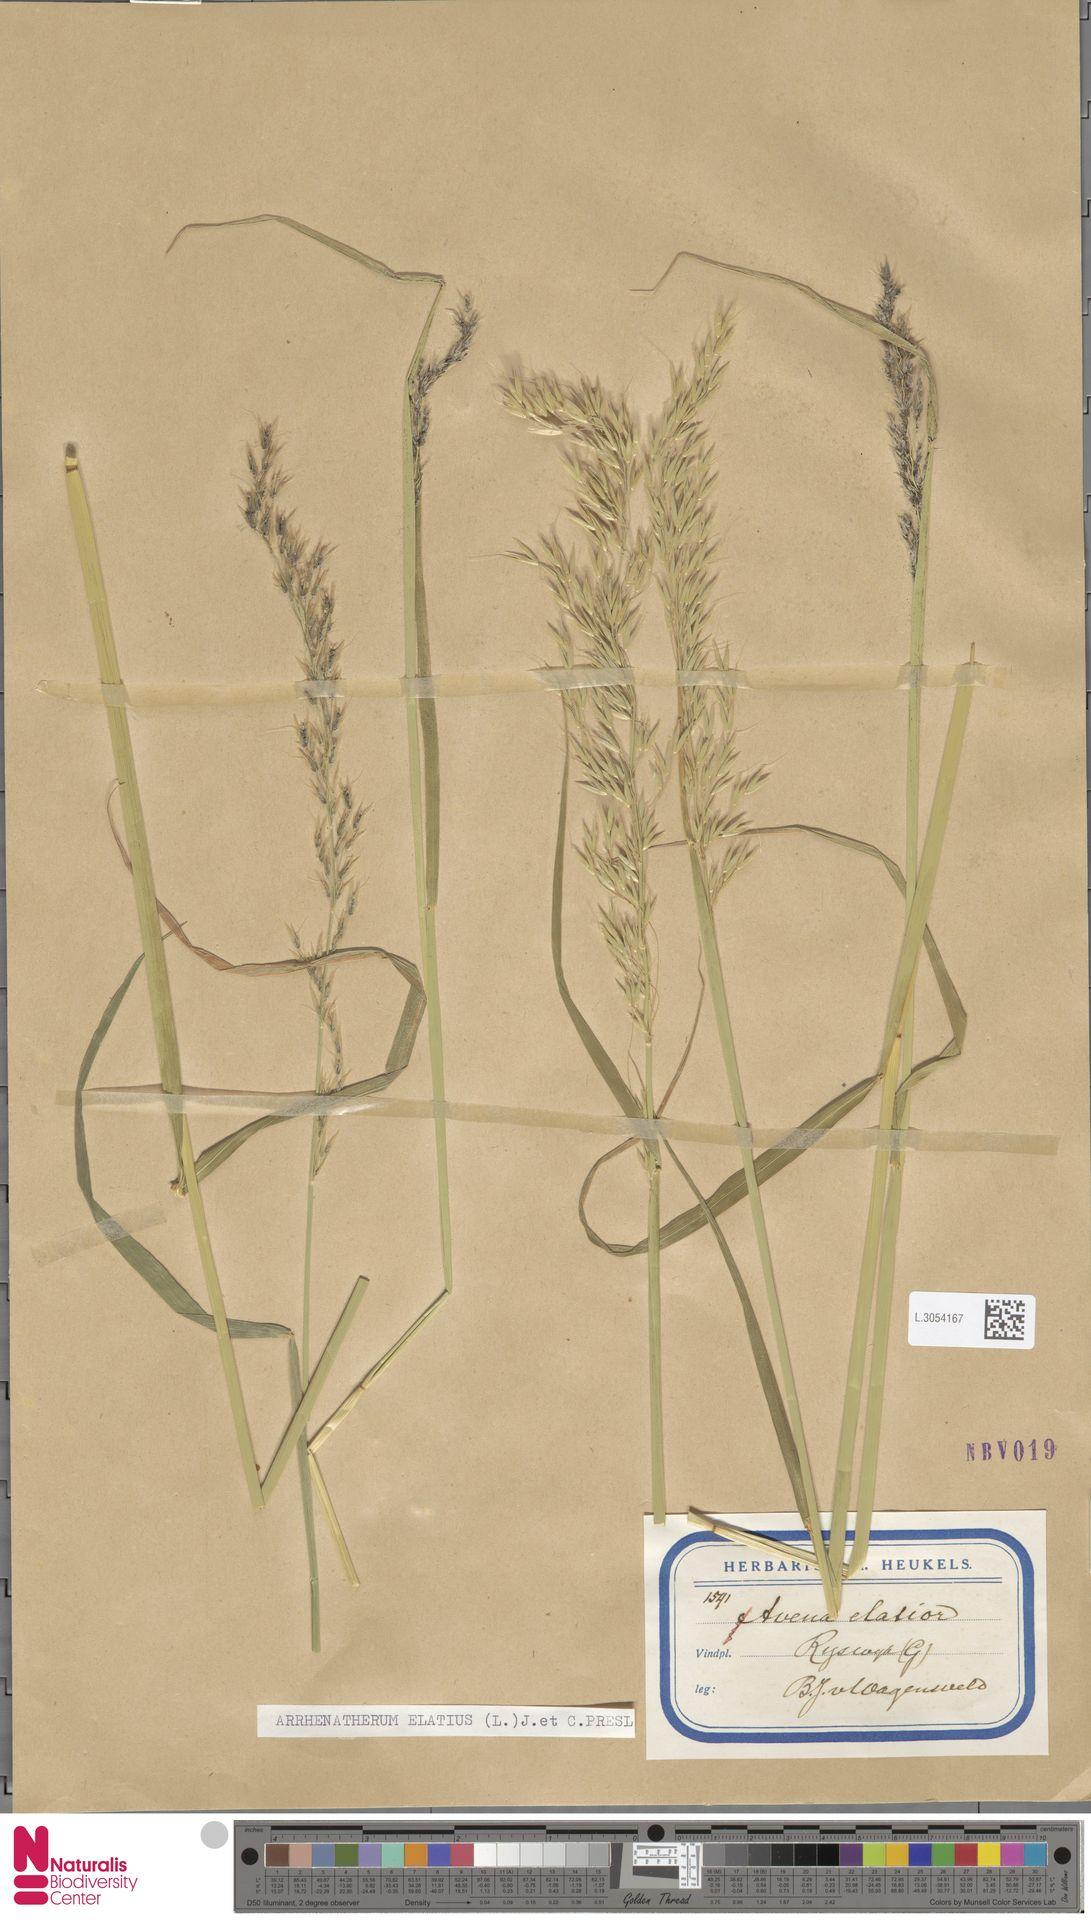 L.3054167 | Arrhenatherum elatius (L.) P.Beauv. ex J.Presl & C.Presl